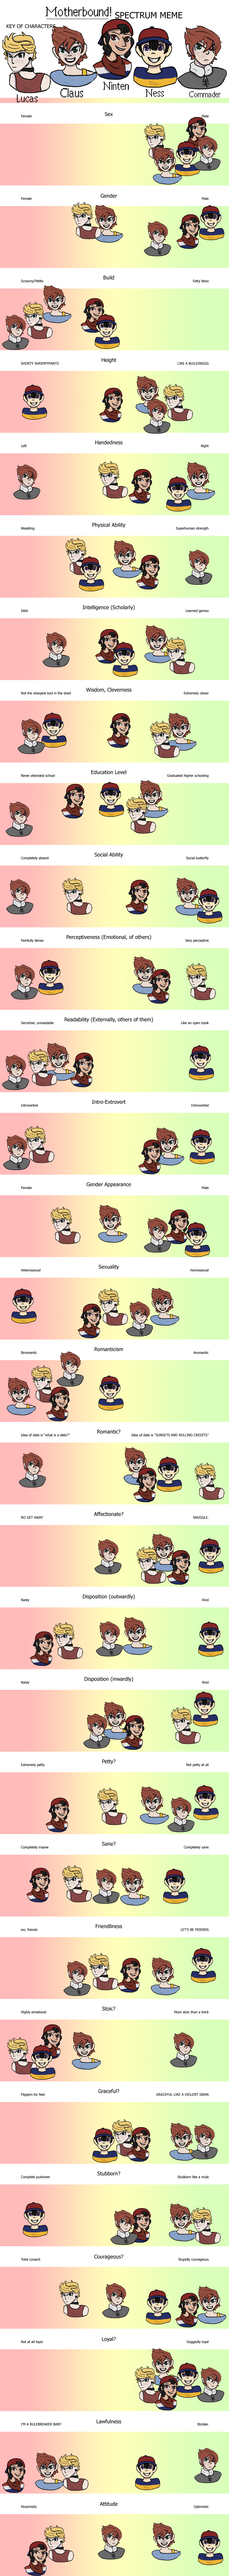 Spectrum Meme Motherbois By Songbird88 Spectrum Meme Motherbois By Songbird88